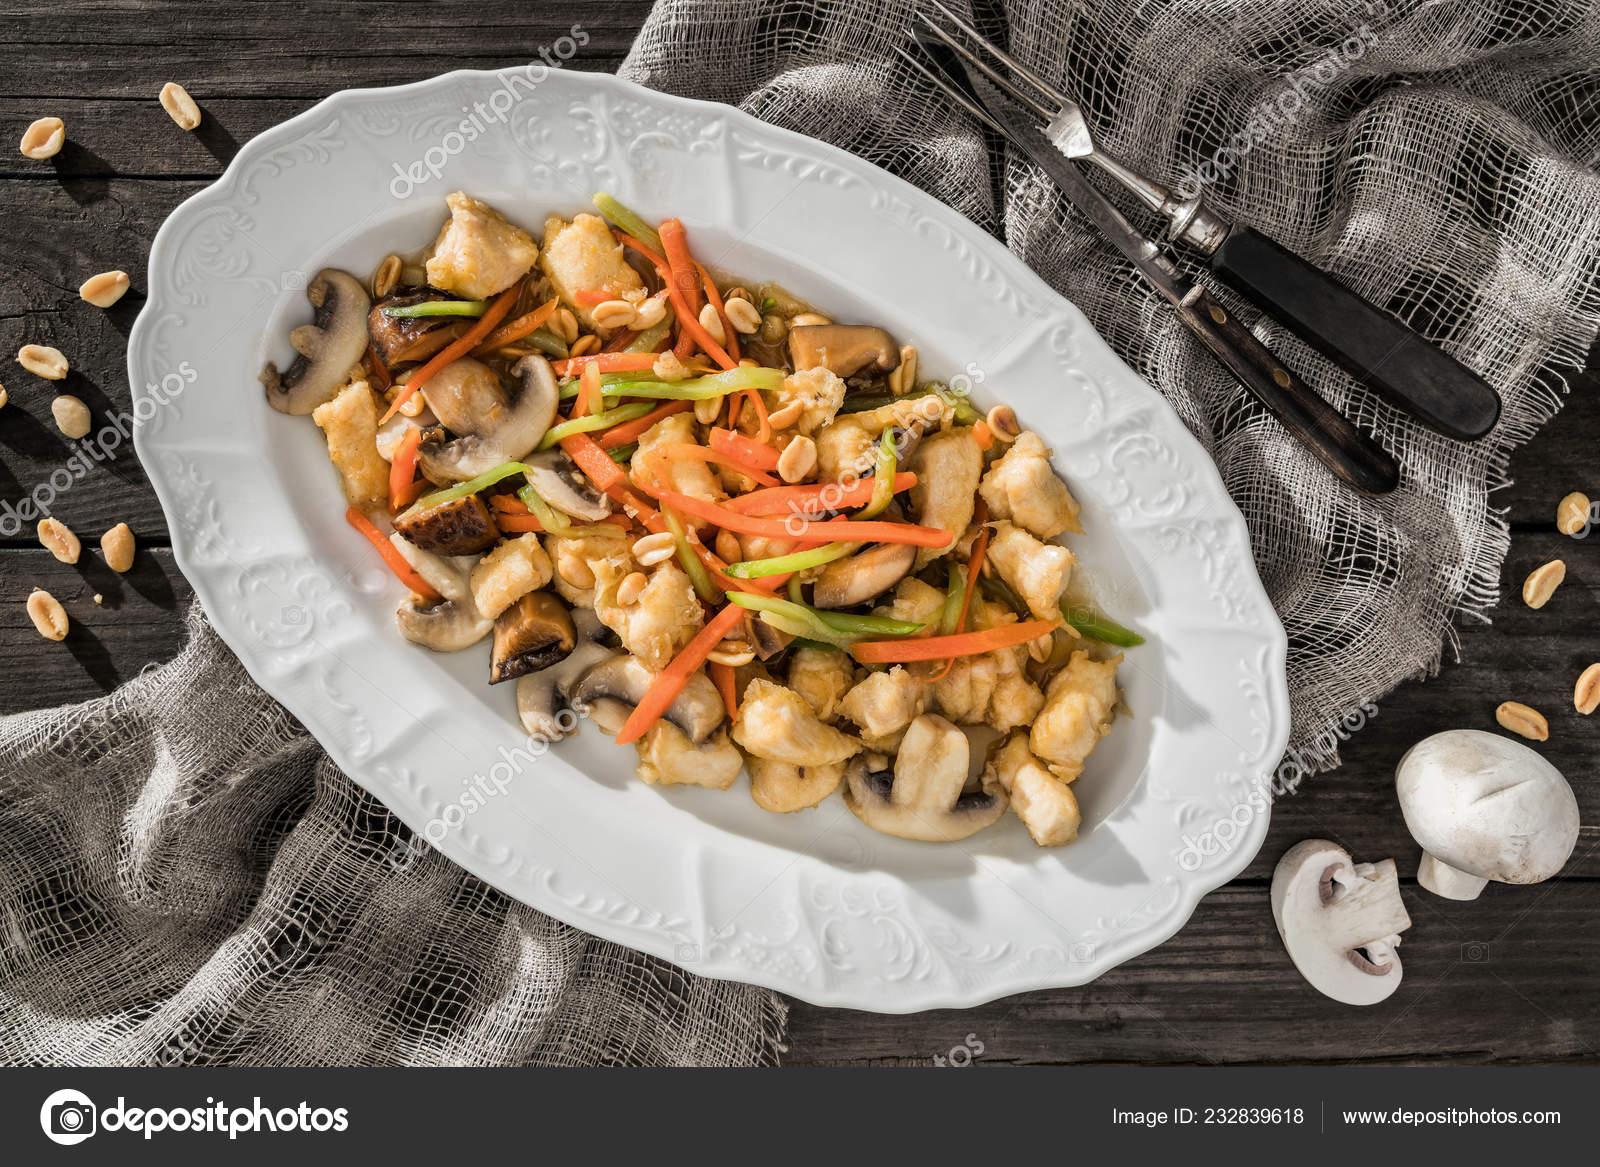 Christmas Meat Dishes.Christmas Meat Dishes Grilled Vegetables Nuts Mushrooms